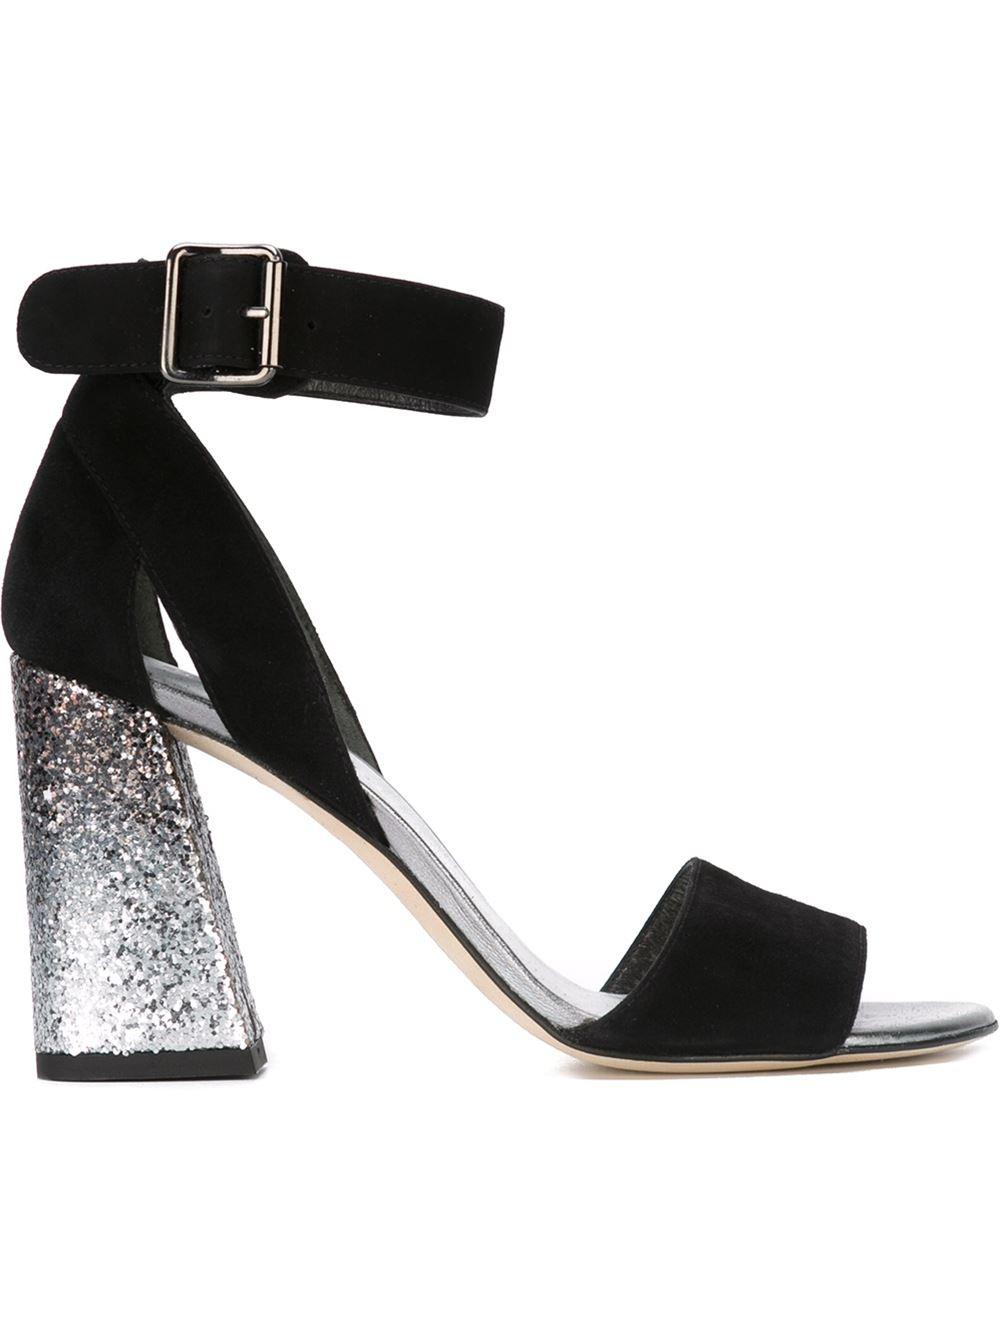 Stuart Weitzman Mostly Suede sandals, FarFetch.com